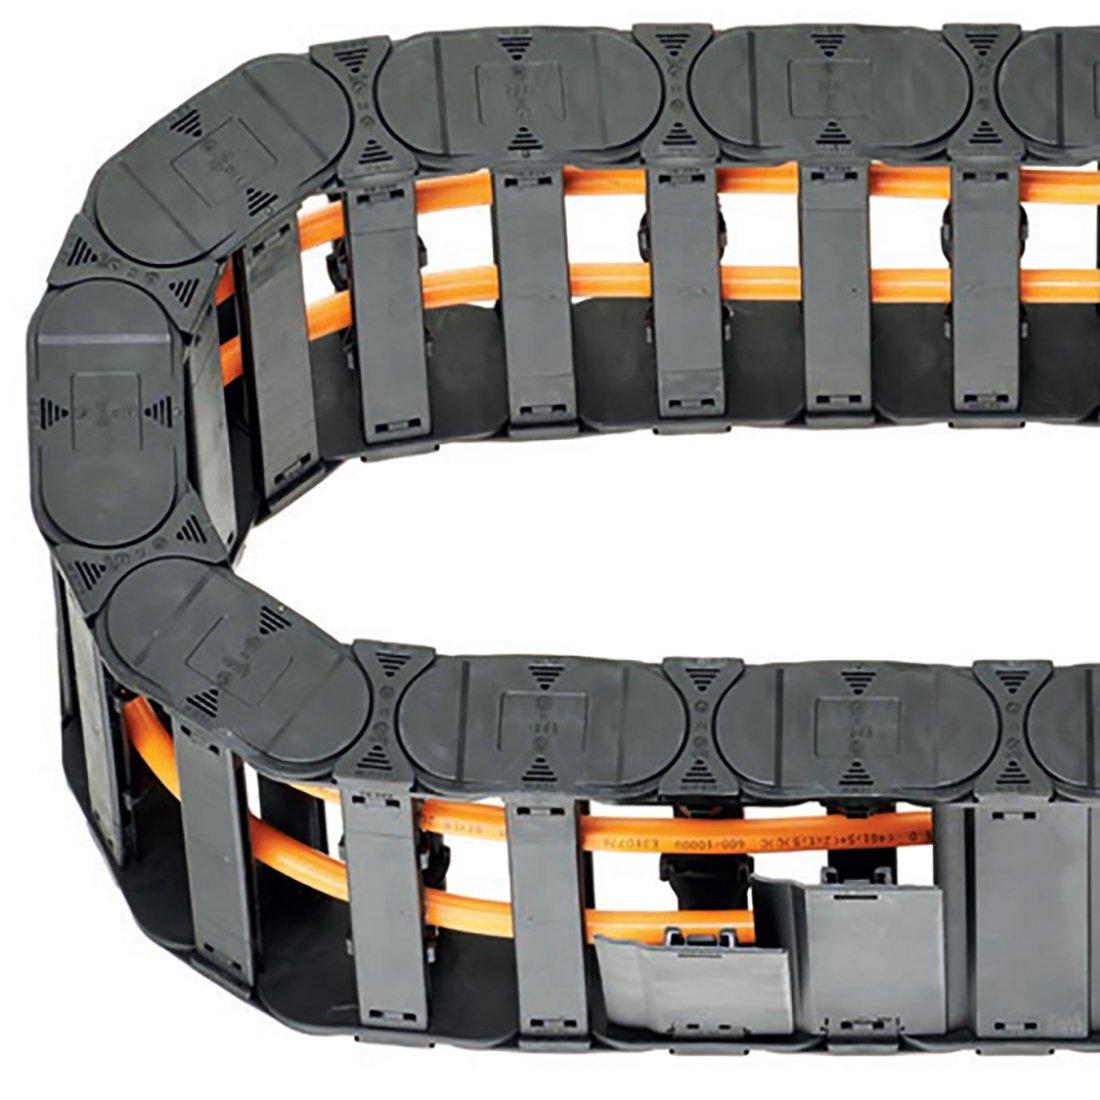 SYNCE009408 /negro cable pl/ástico Arrastrar Cadena Cable Carrier 1/m longitud para CNC Sourcingmap/